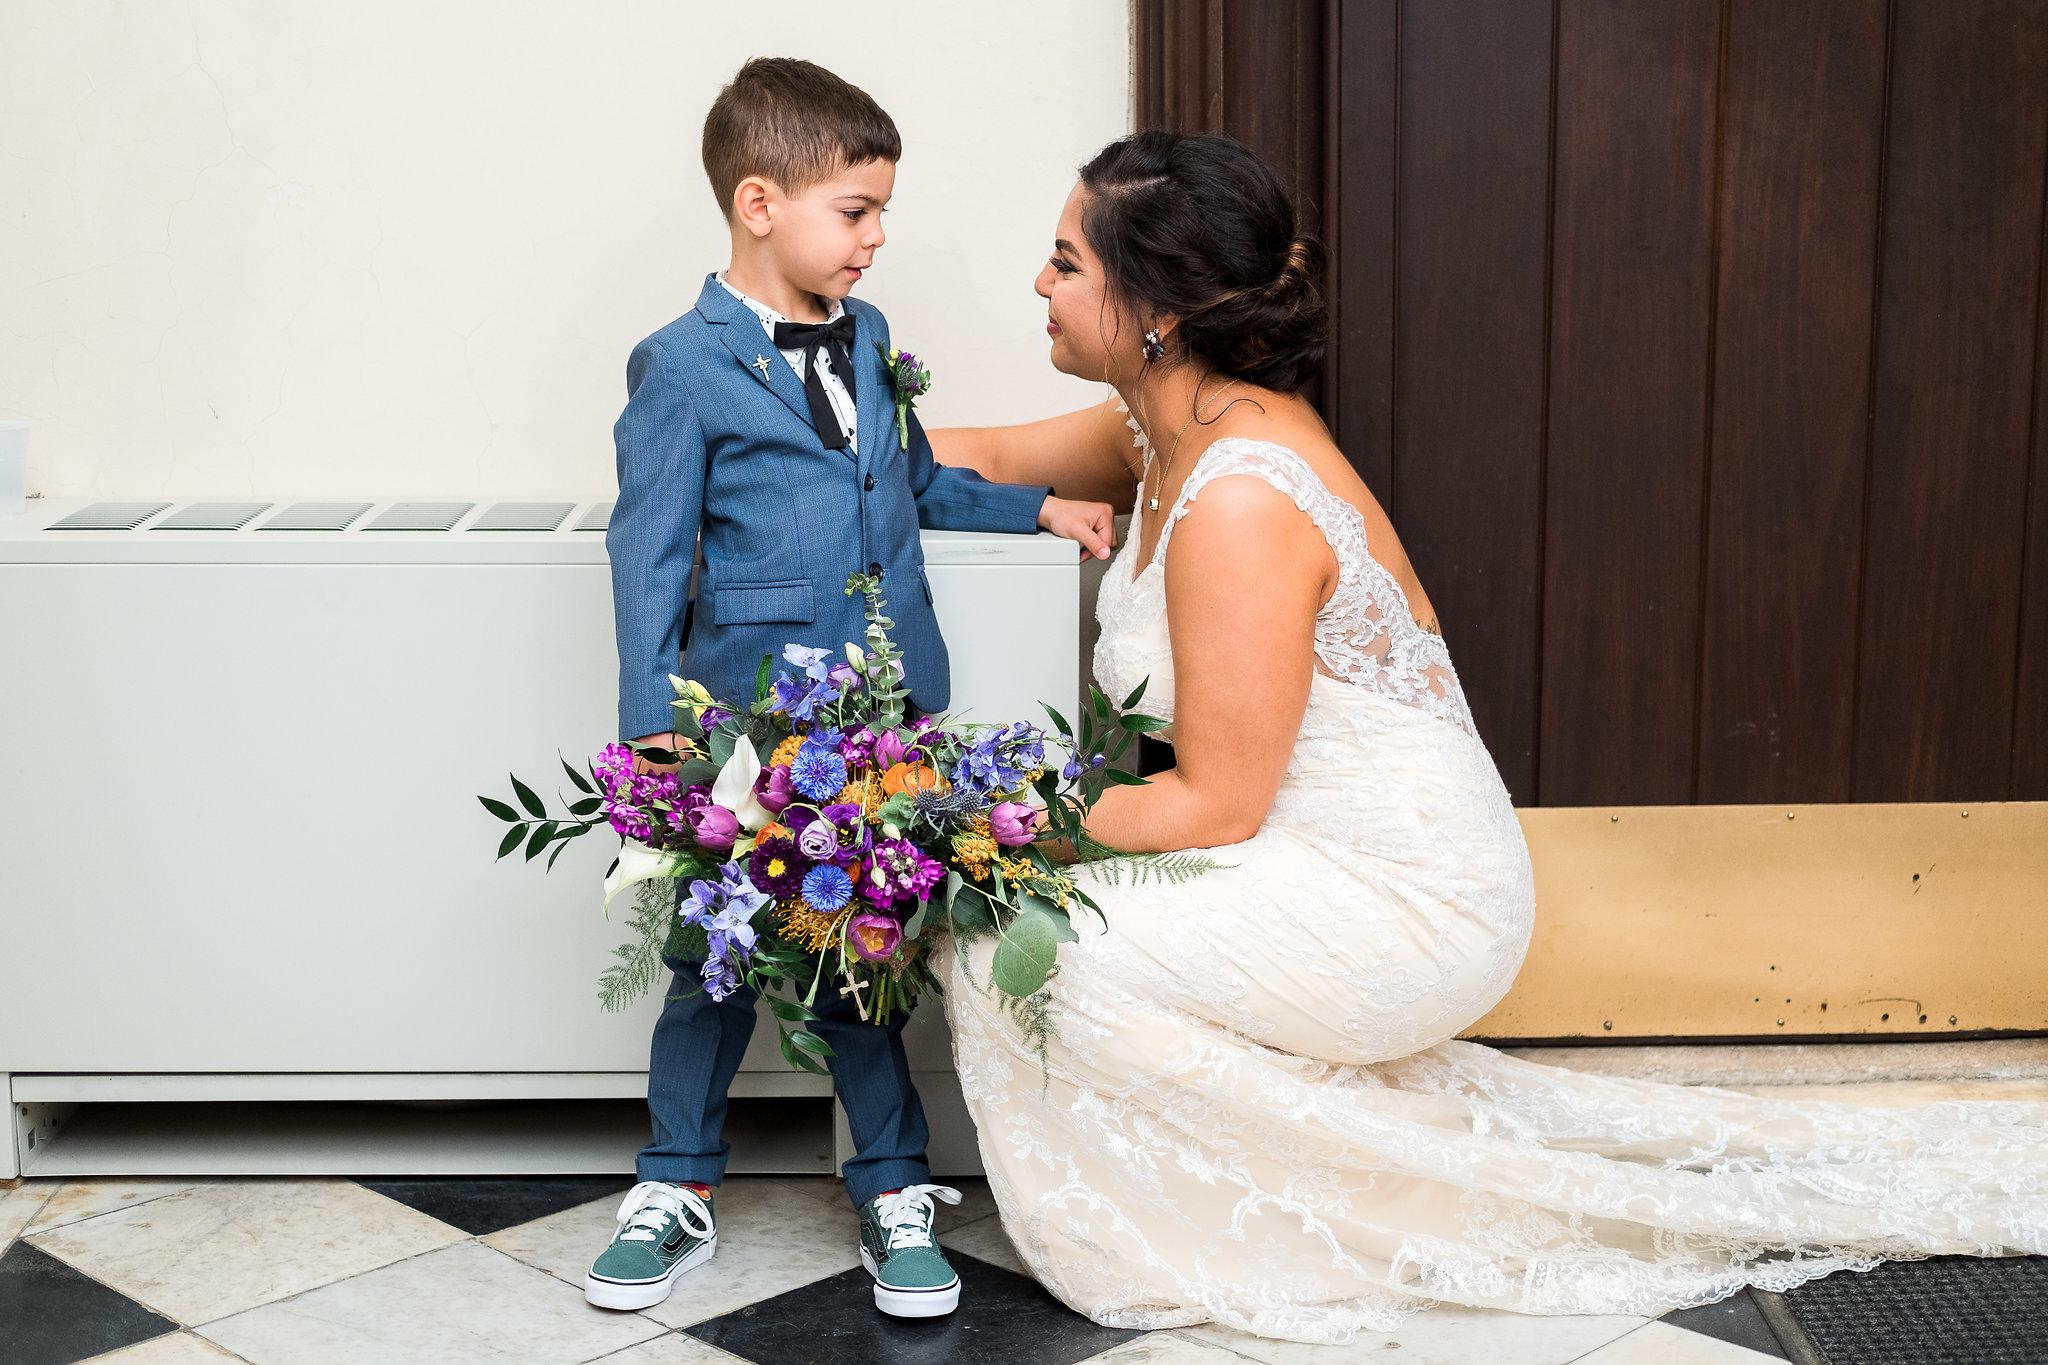 Bride with son before wedding ceremony